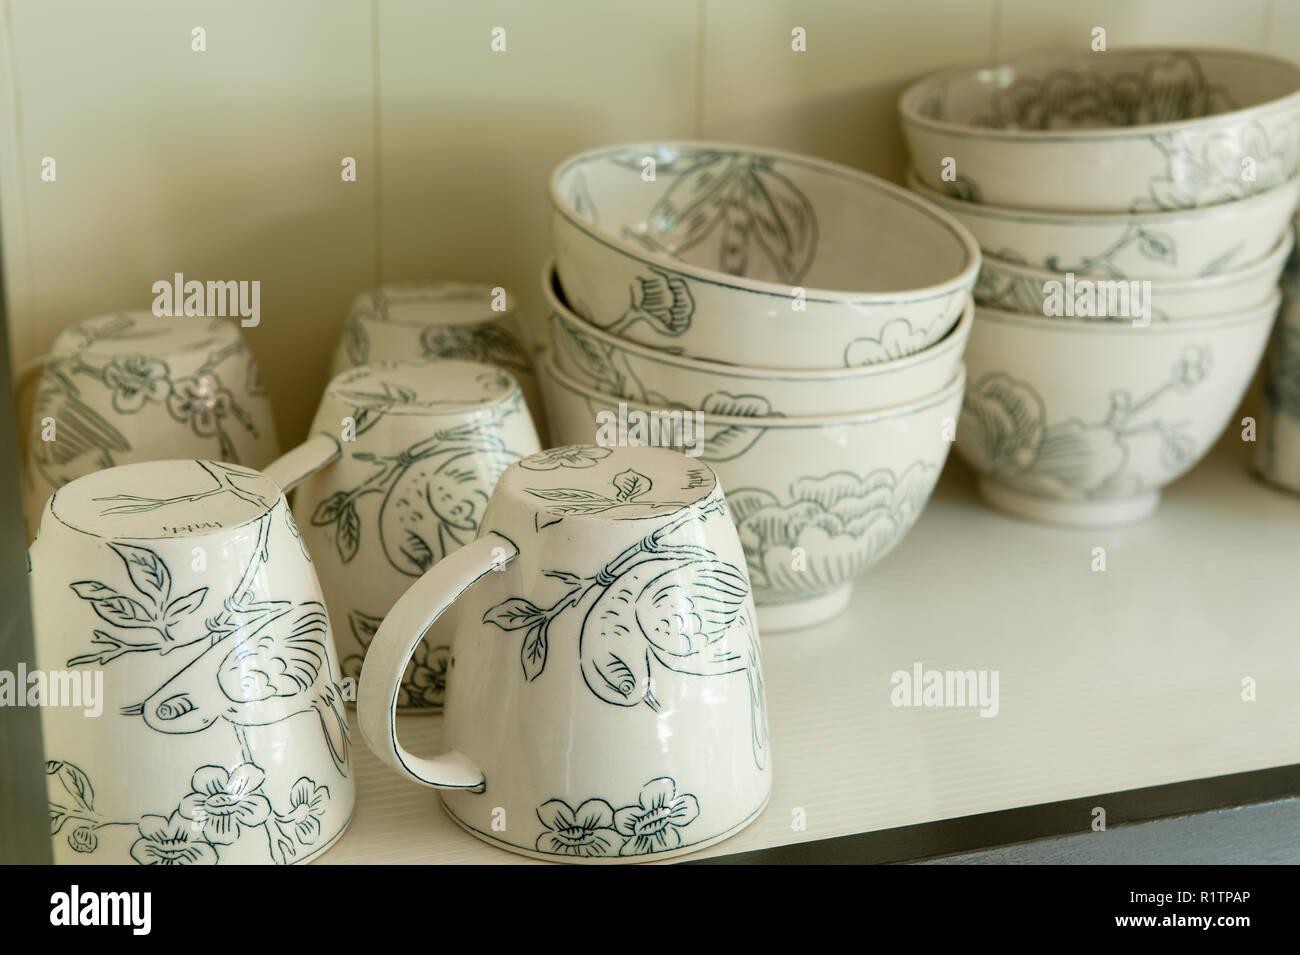 Bird themed tableware - Stock Image